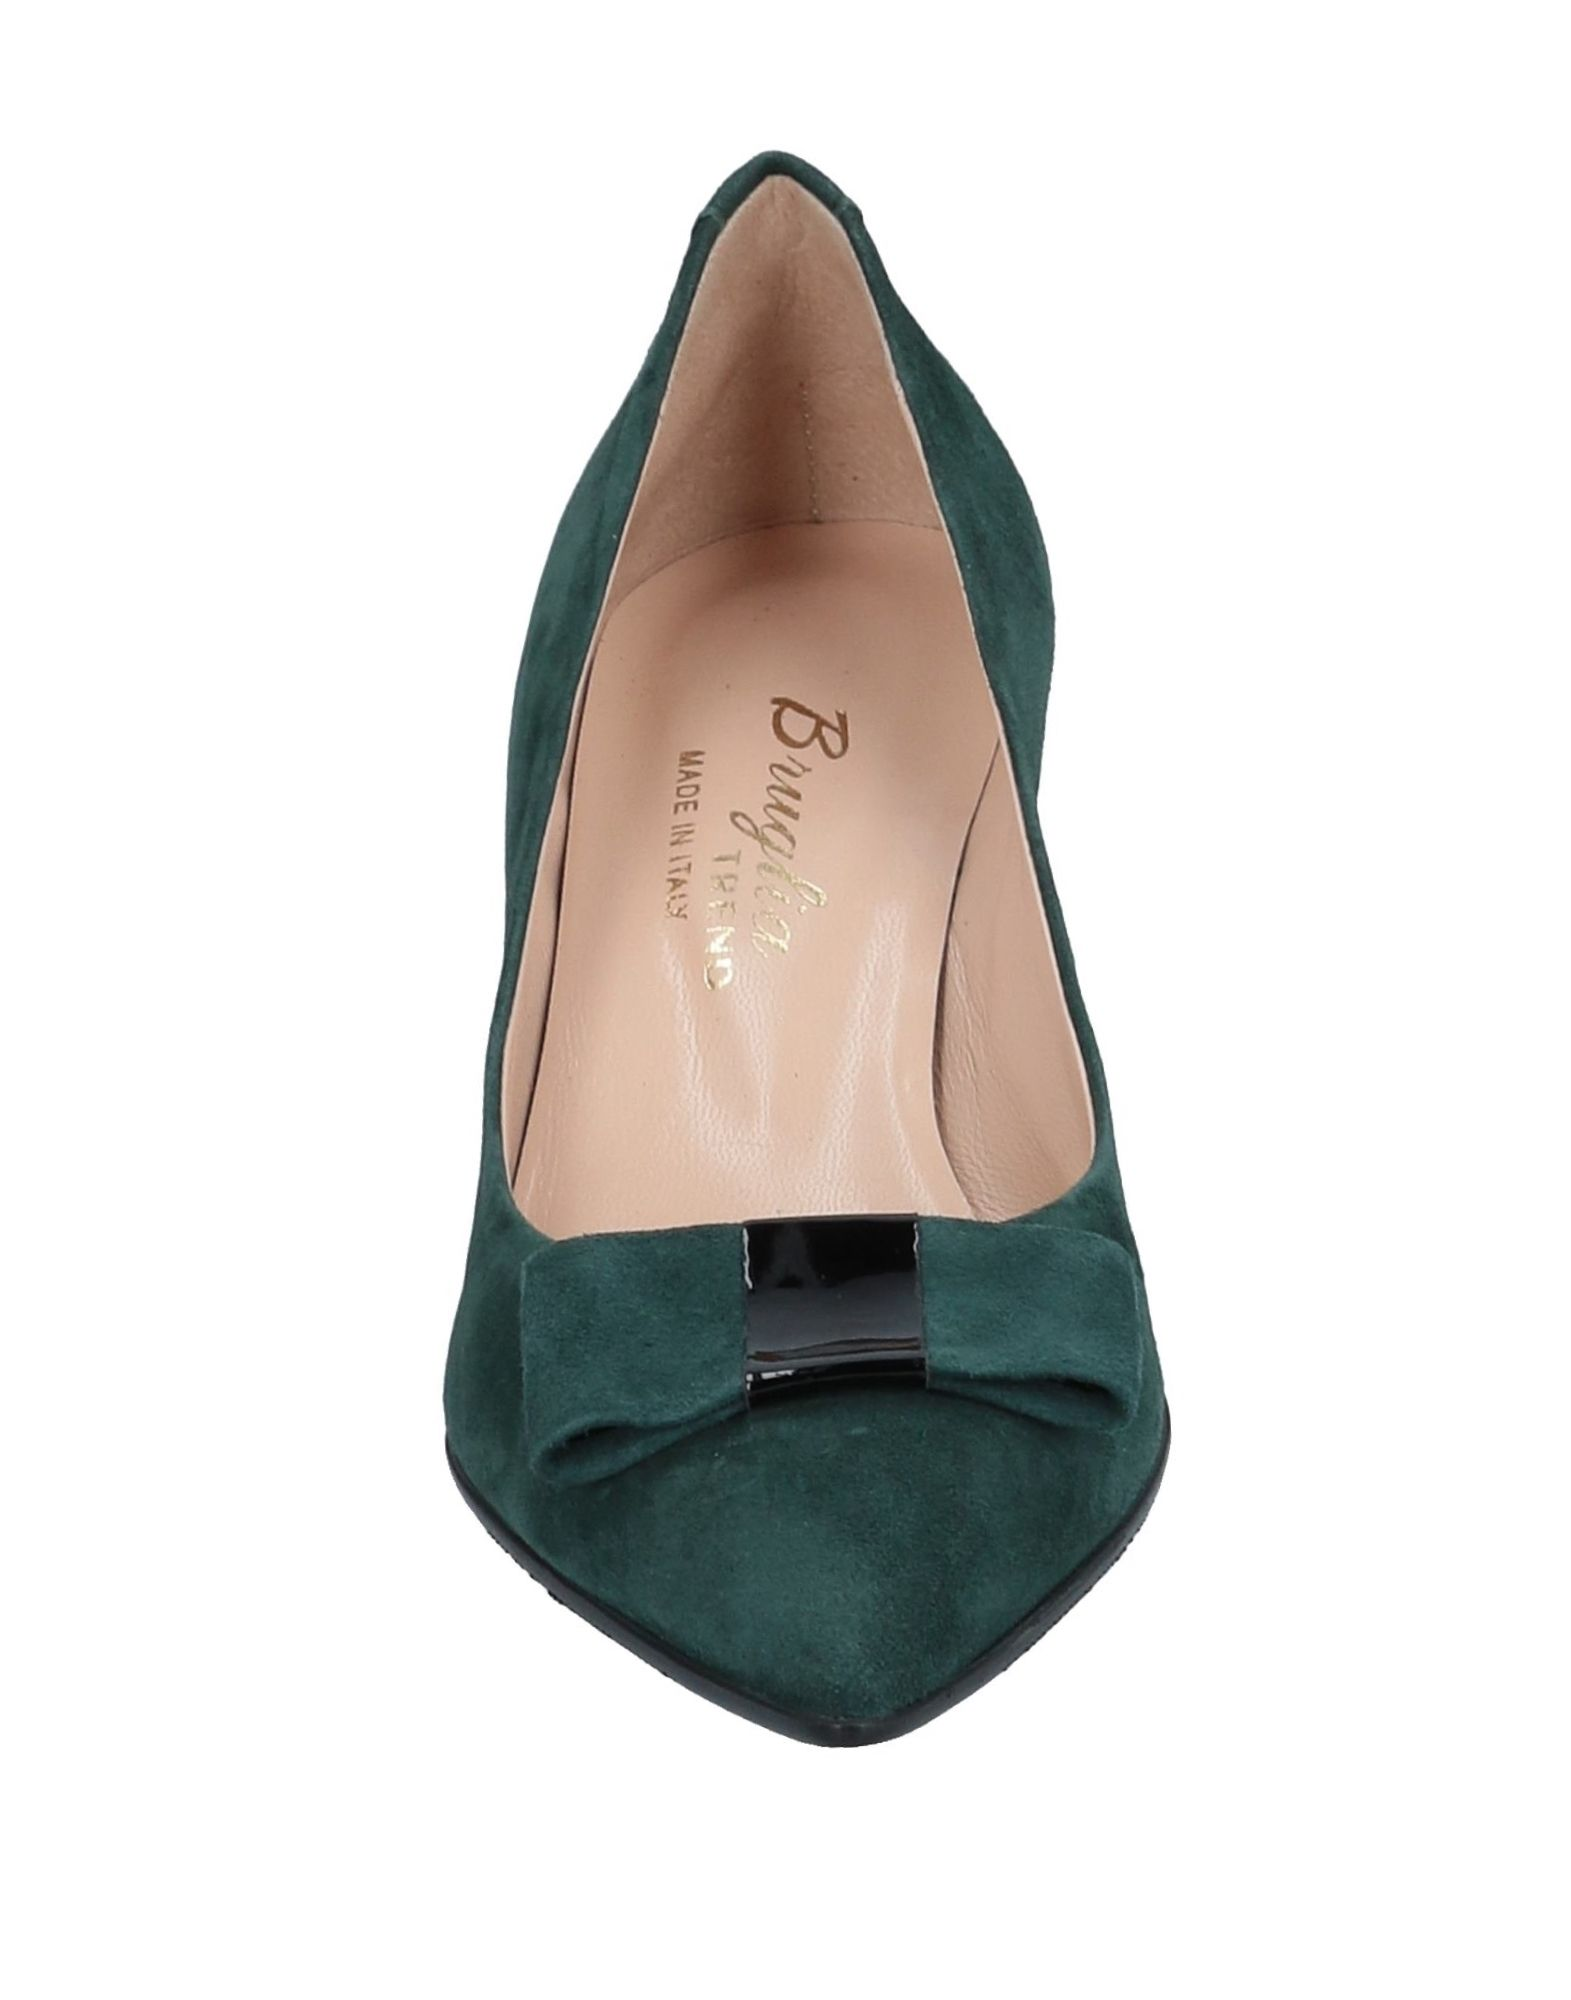 Stilvolle Stilvolle Stilvolle billige Schuhe F.Lli Bruglia Pumps Damen  11520137QN b9301e